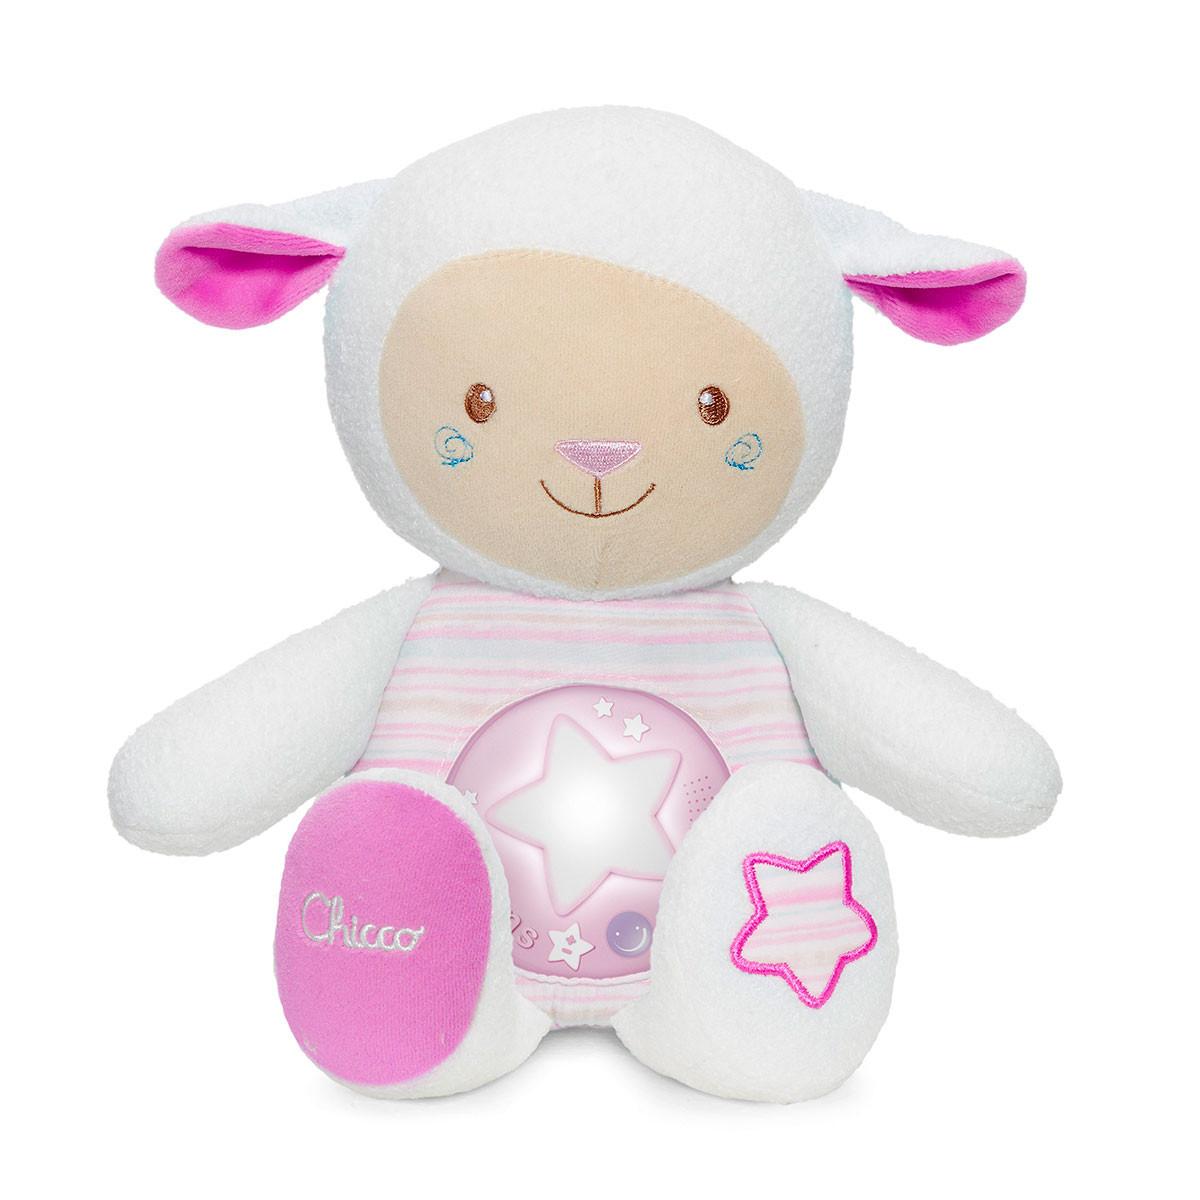 Chicco proyector ovejita dulces nanas rosa